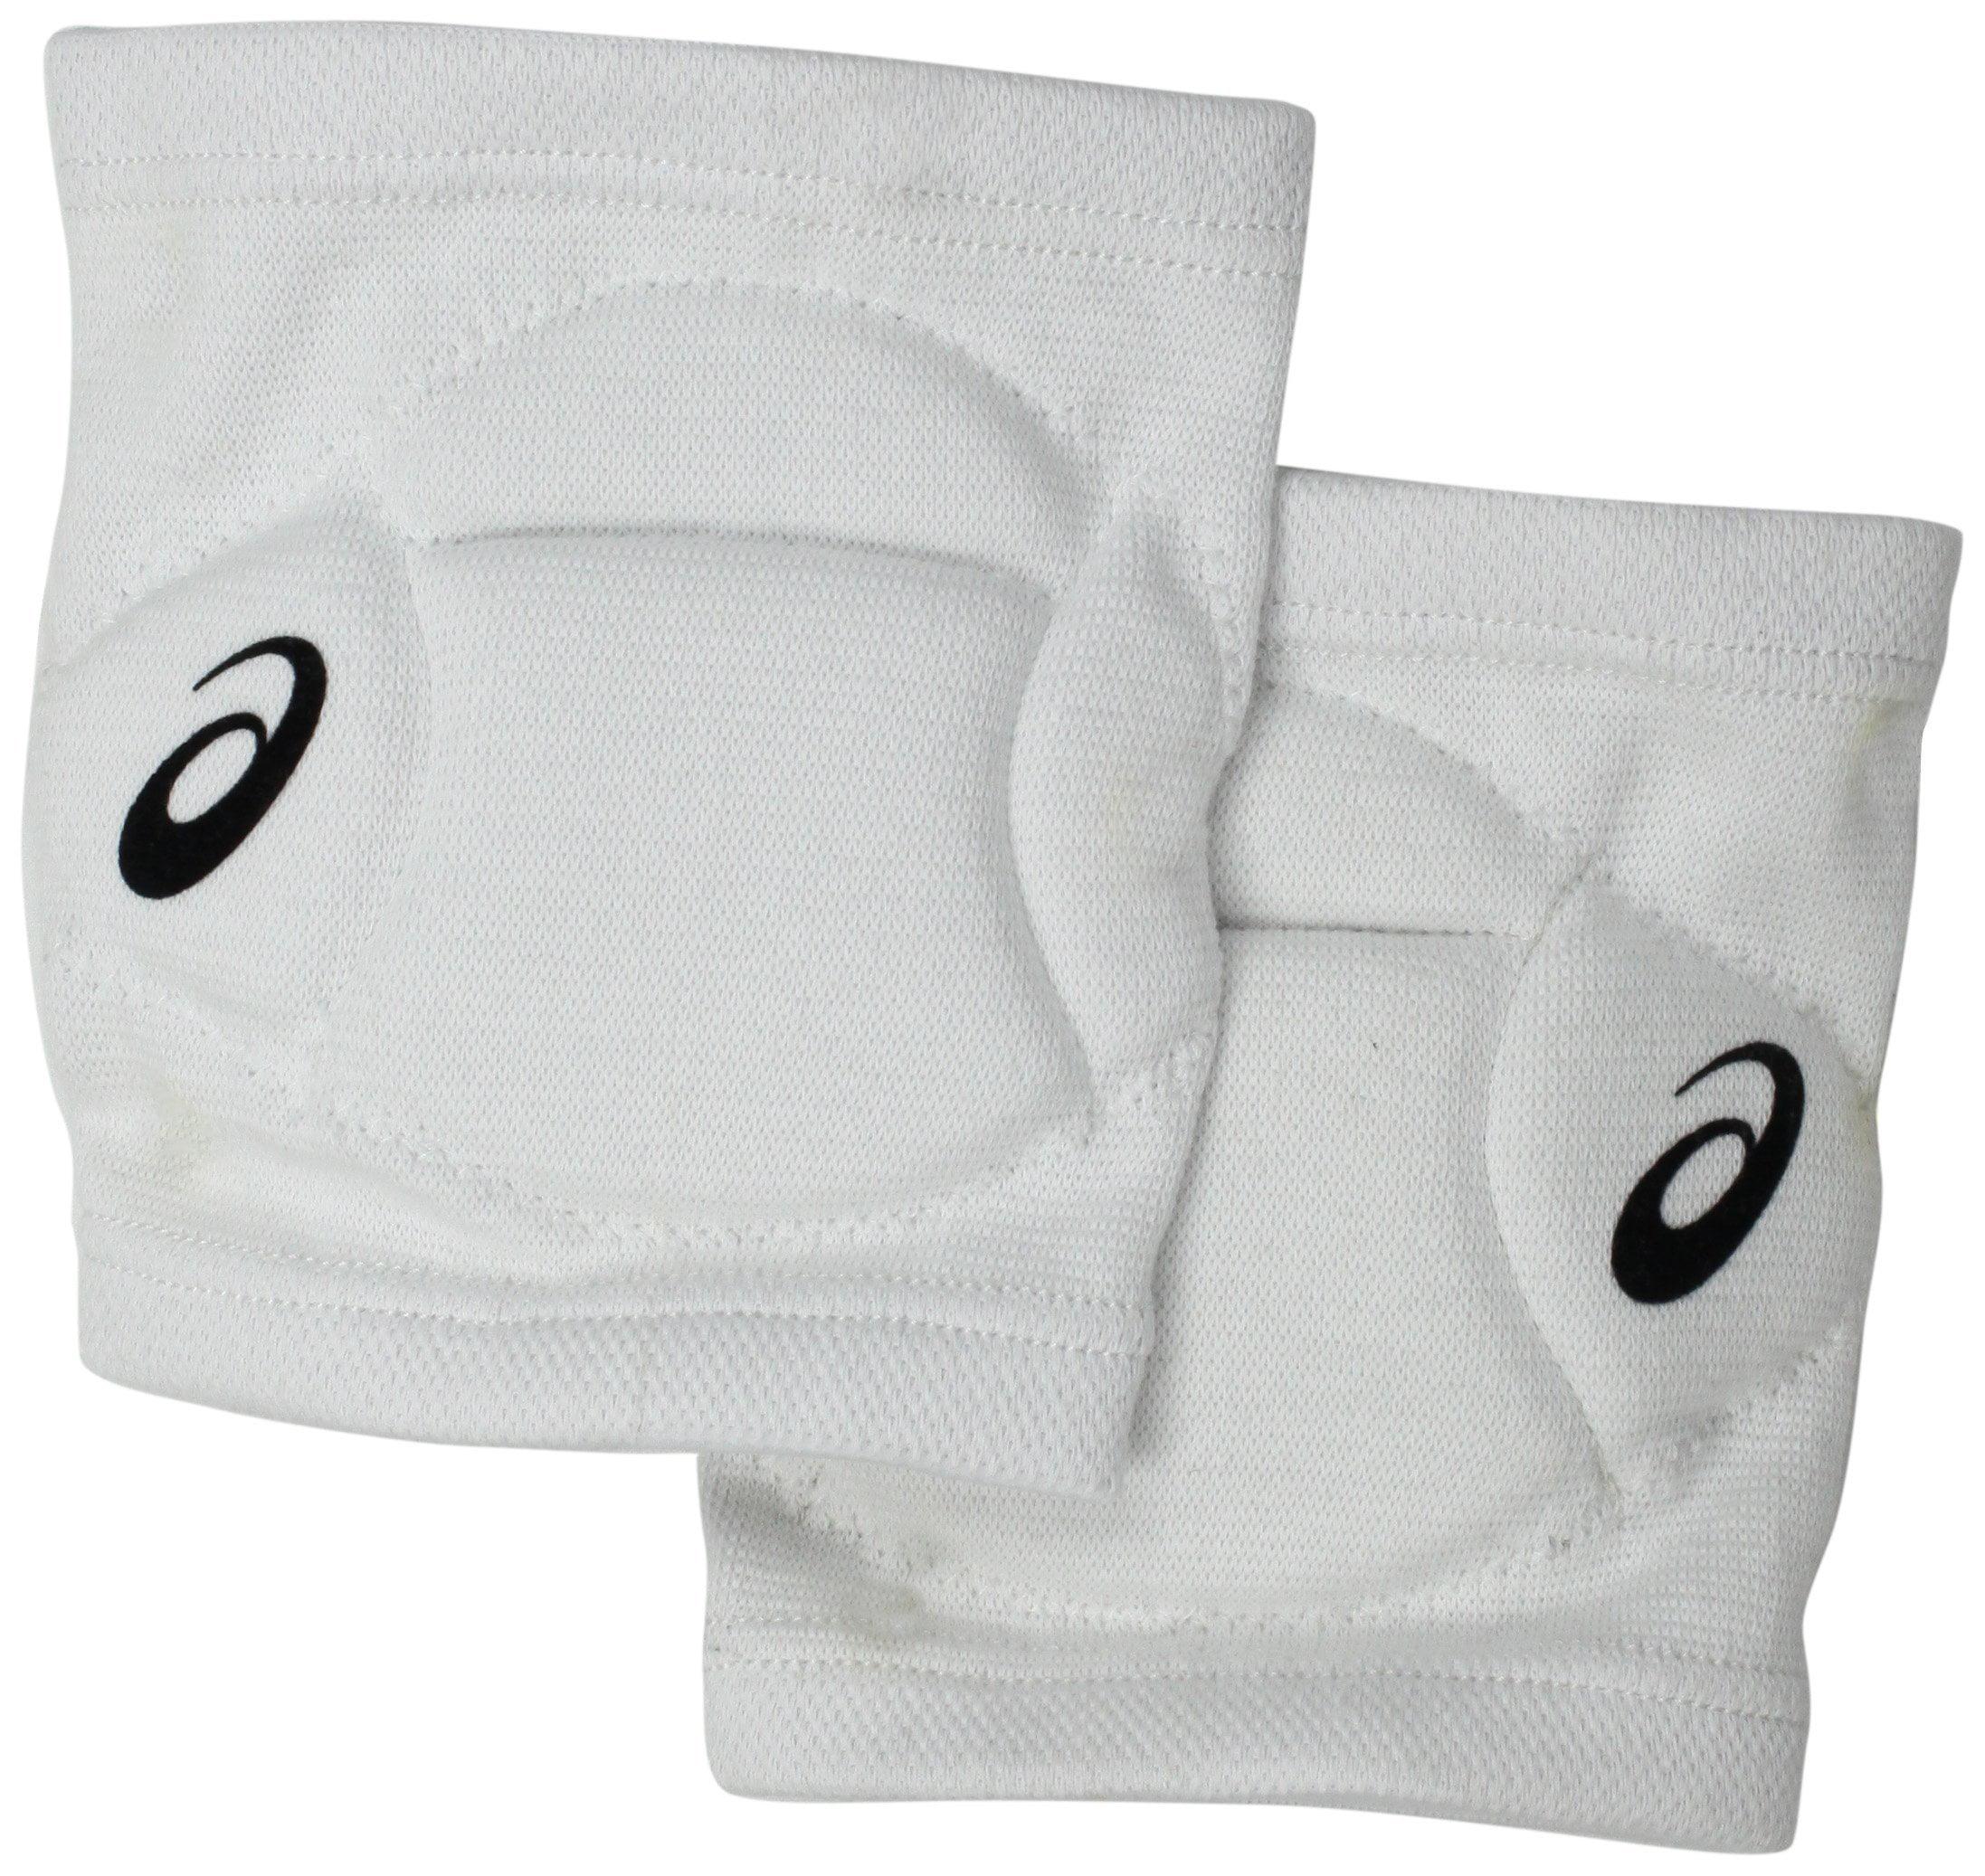 ASICS Setter Knee Pad One Size Fits All White - Walmart.com